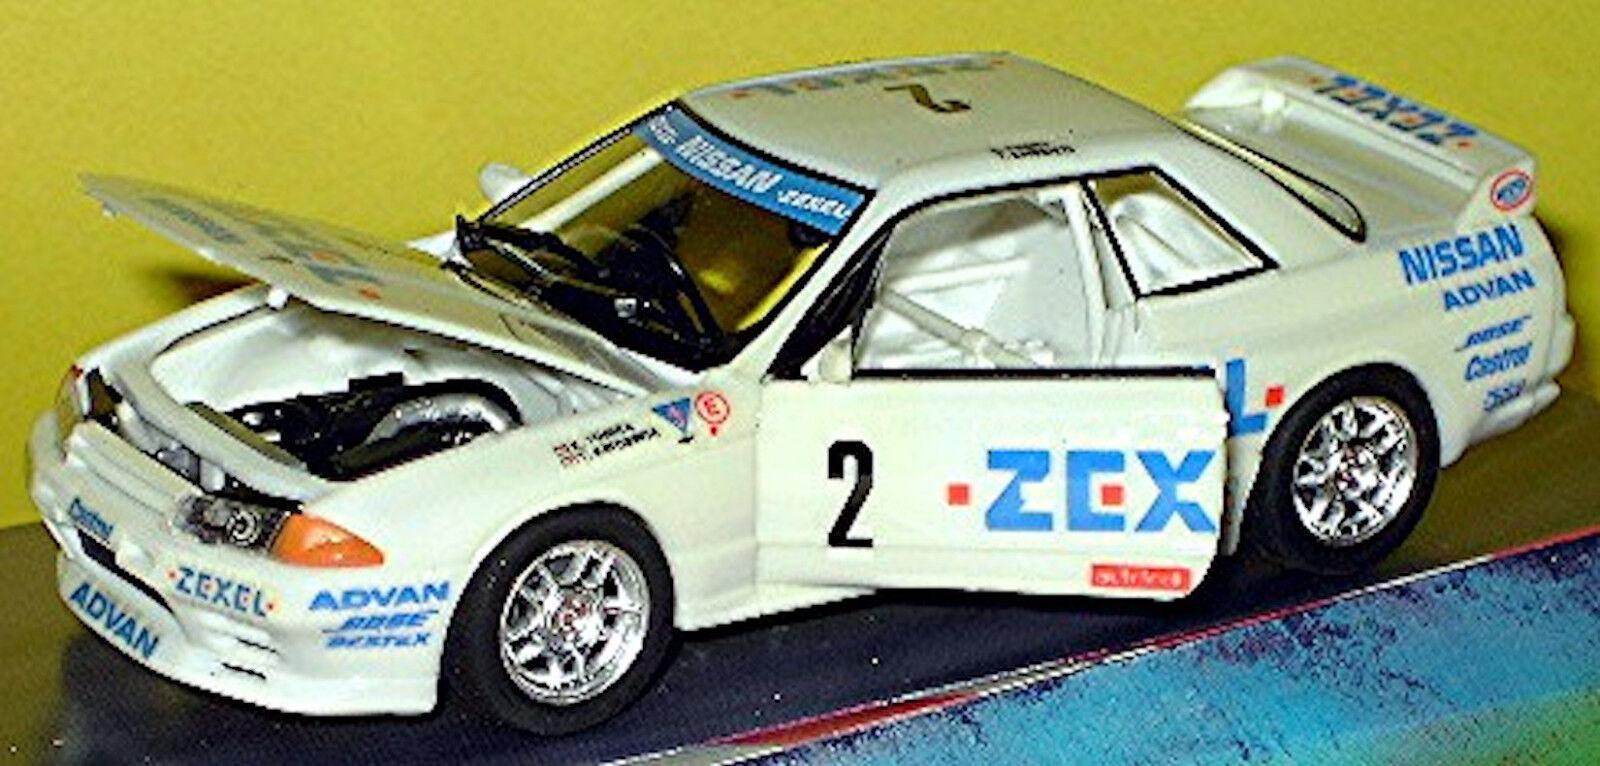 Nissan Skyline Gt-R Zexel   2 Jgtc 1998 White White 1 43 red